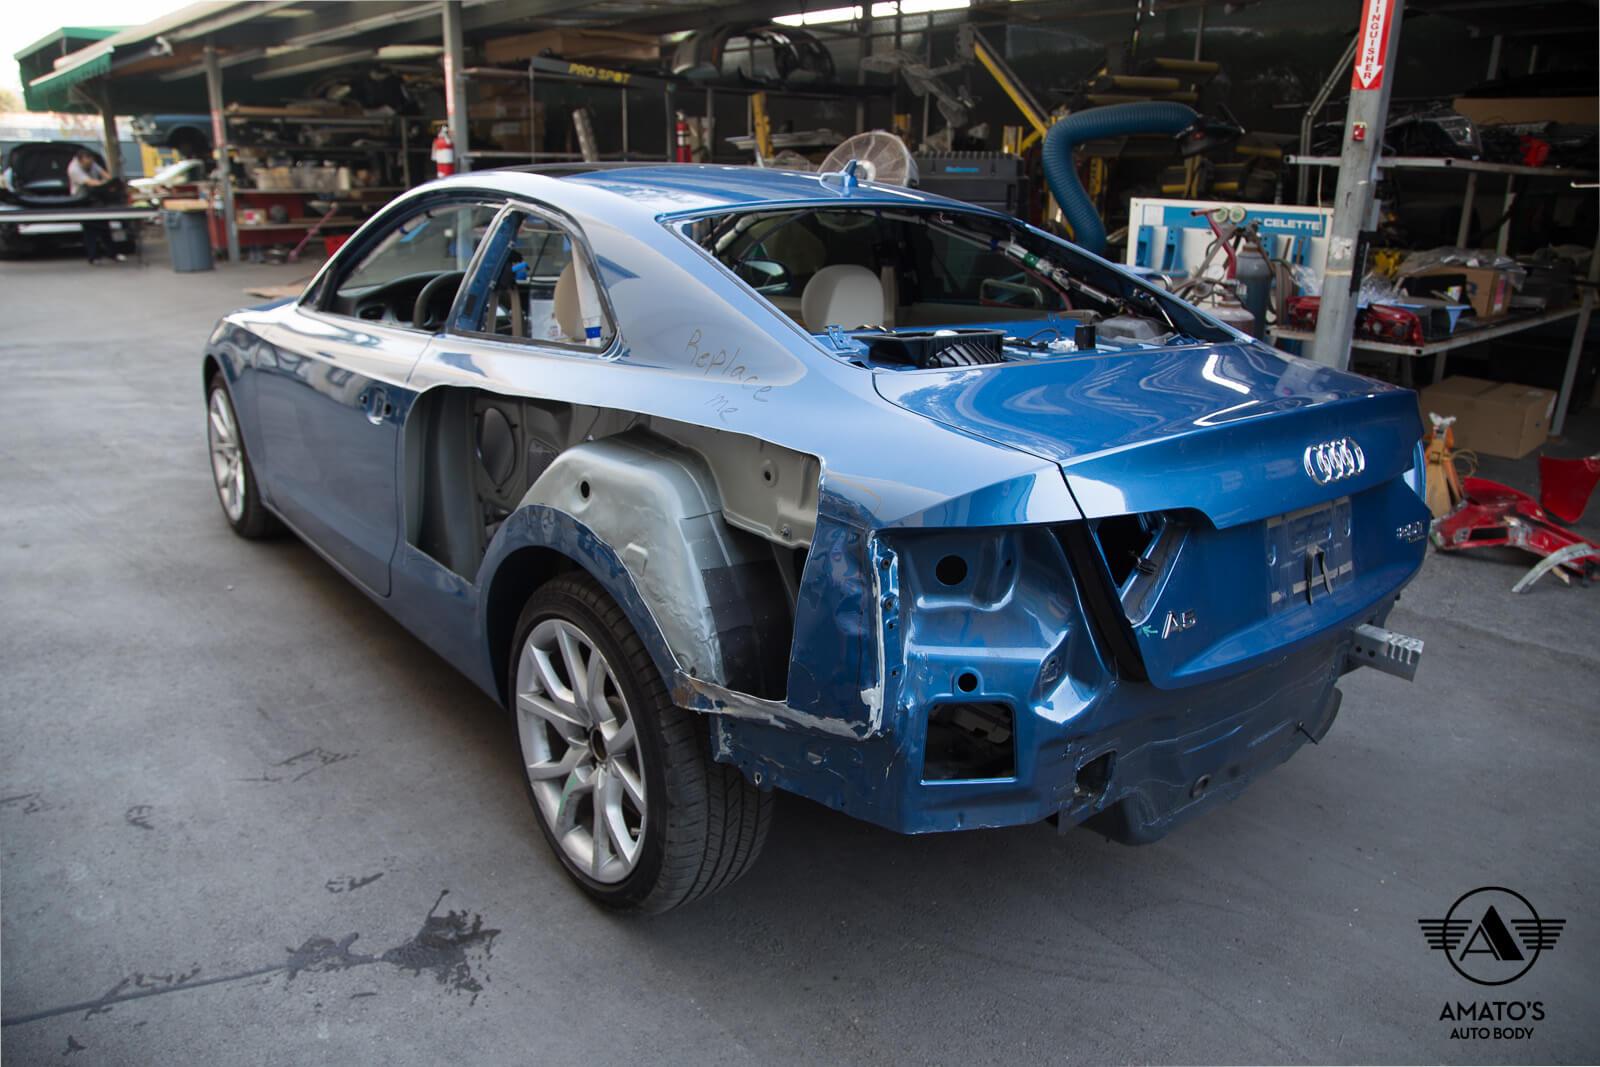 Amatos Auto Body Audi Authorized Certified A Auto Body Painting - Audi auto body